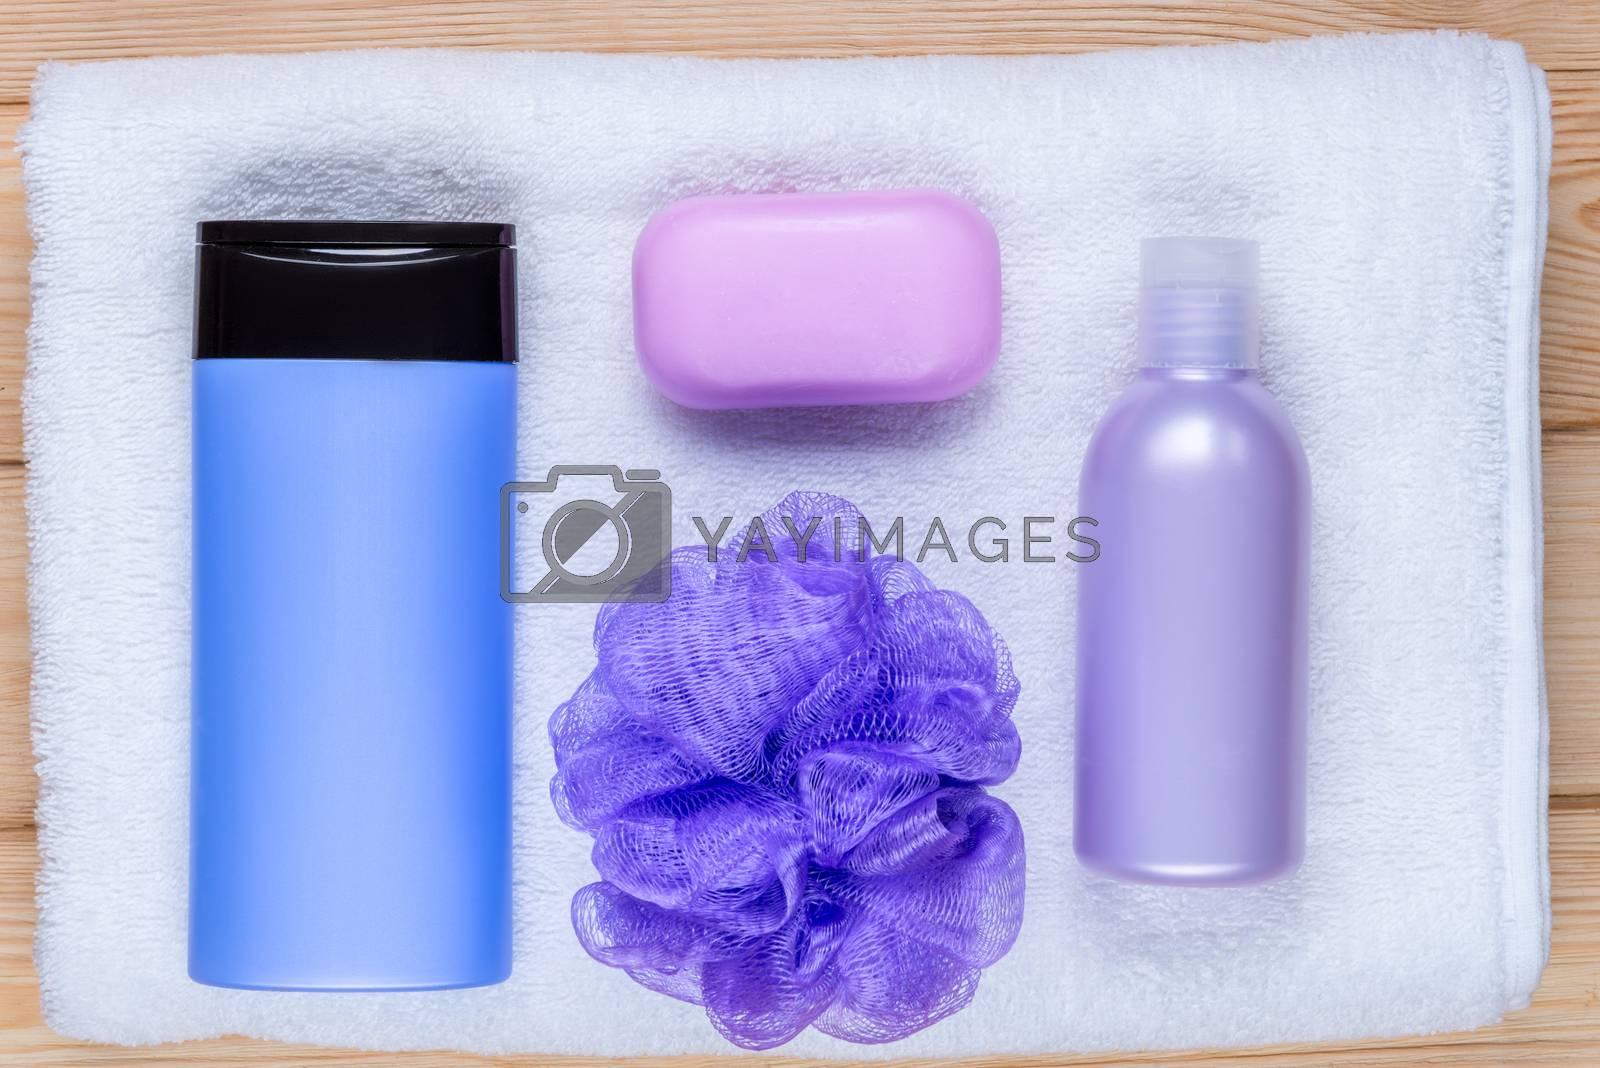 bath cosmetics on a terry towel top view by Labunskiy K.